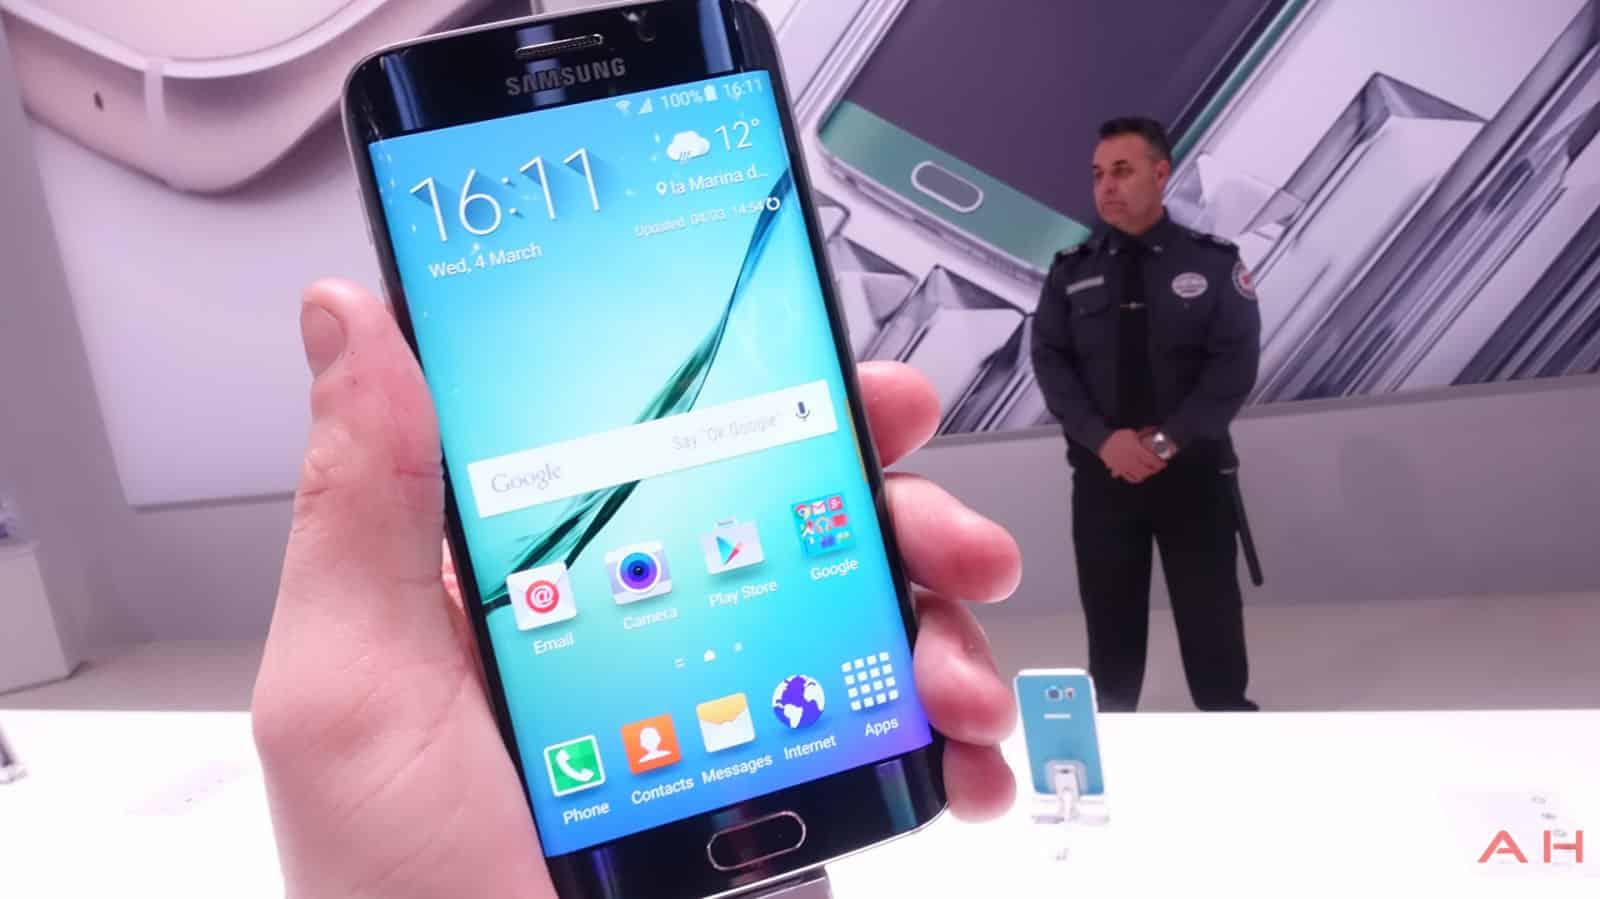 Samsung-Galaxy-S6-Edge-AH-14